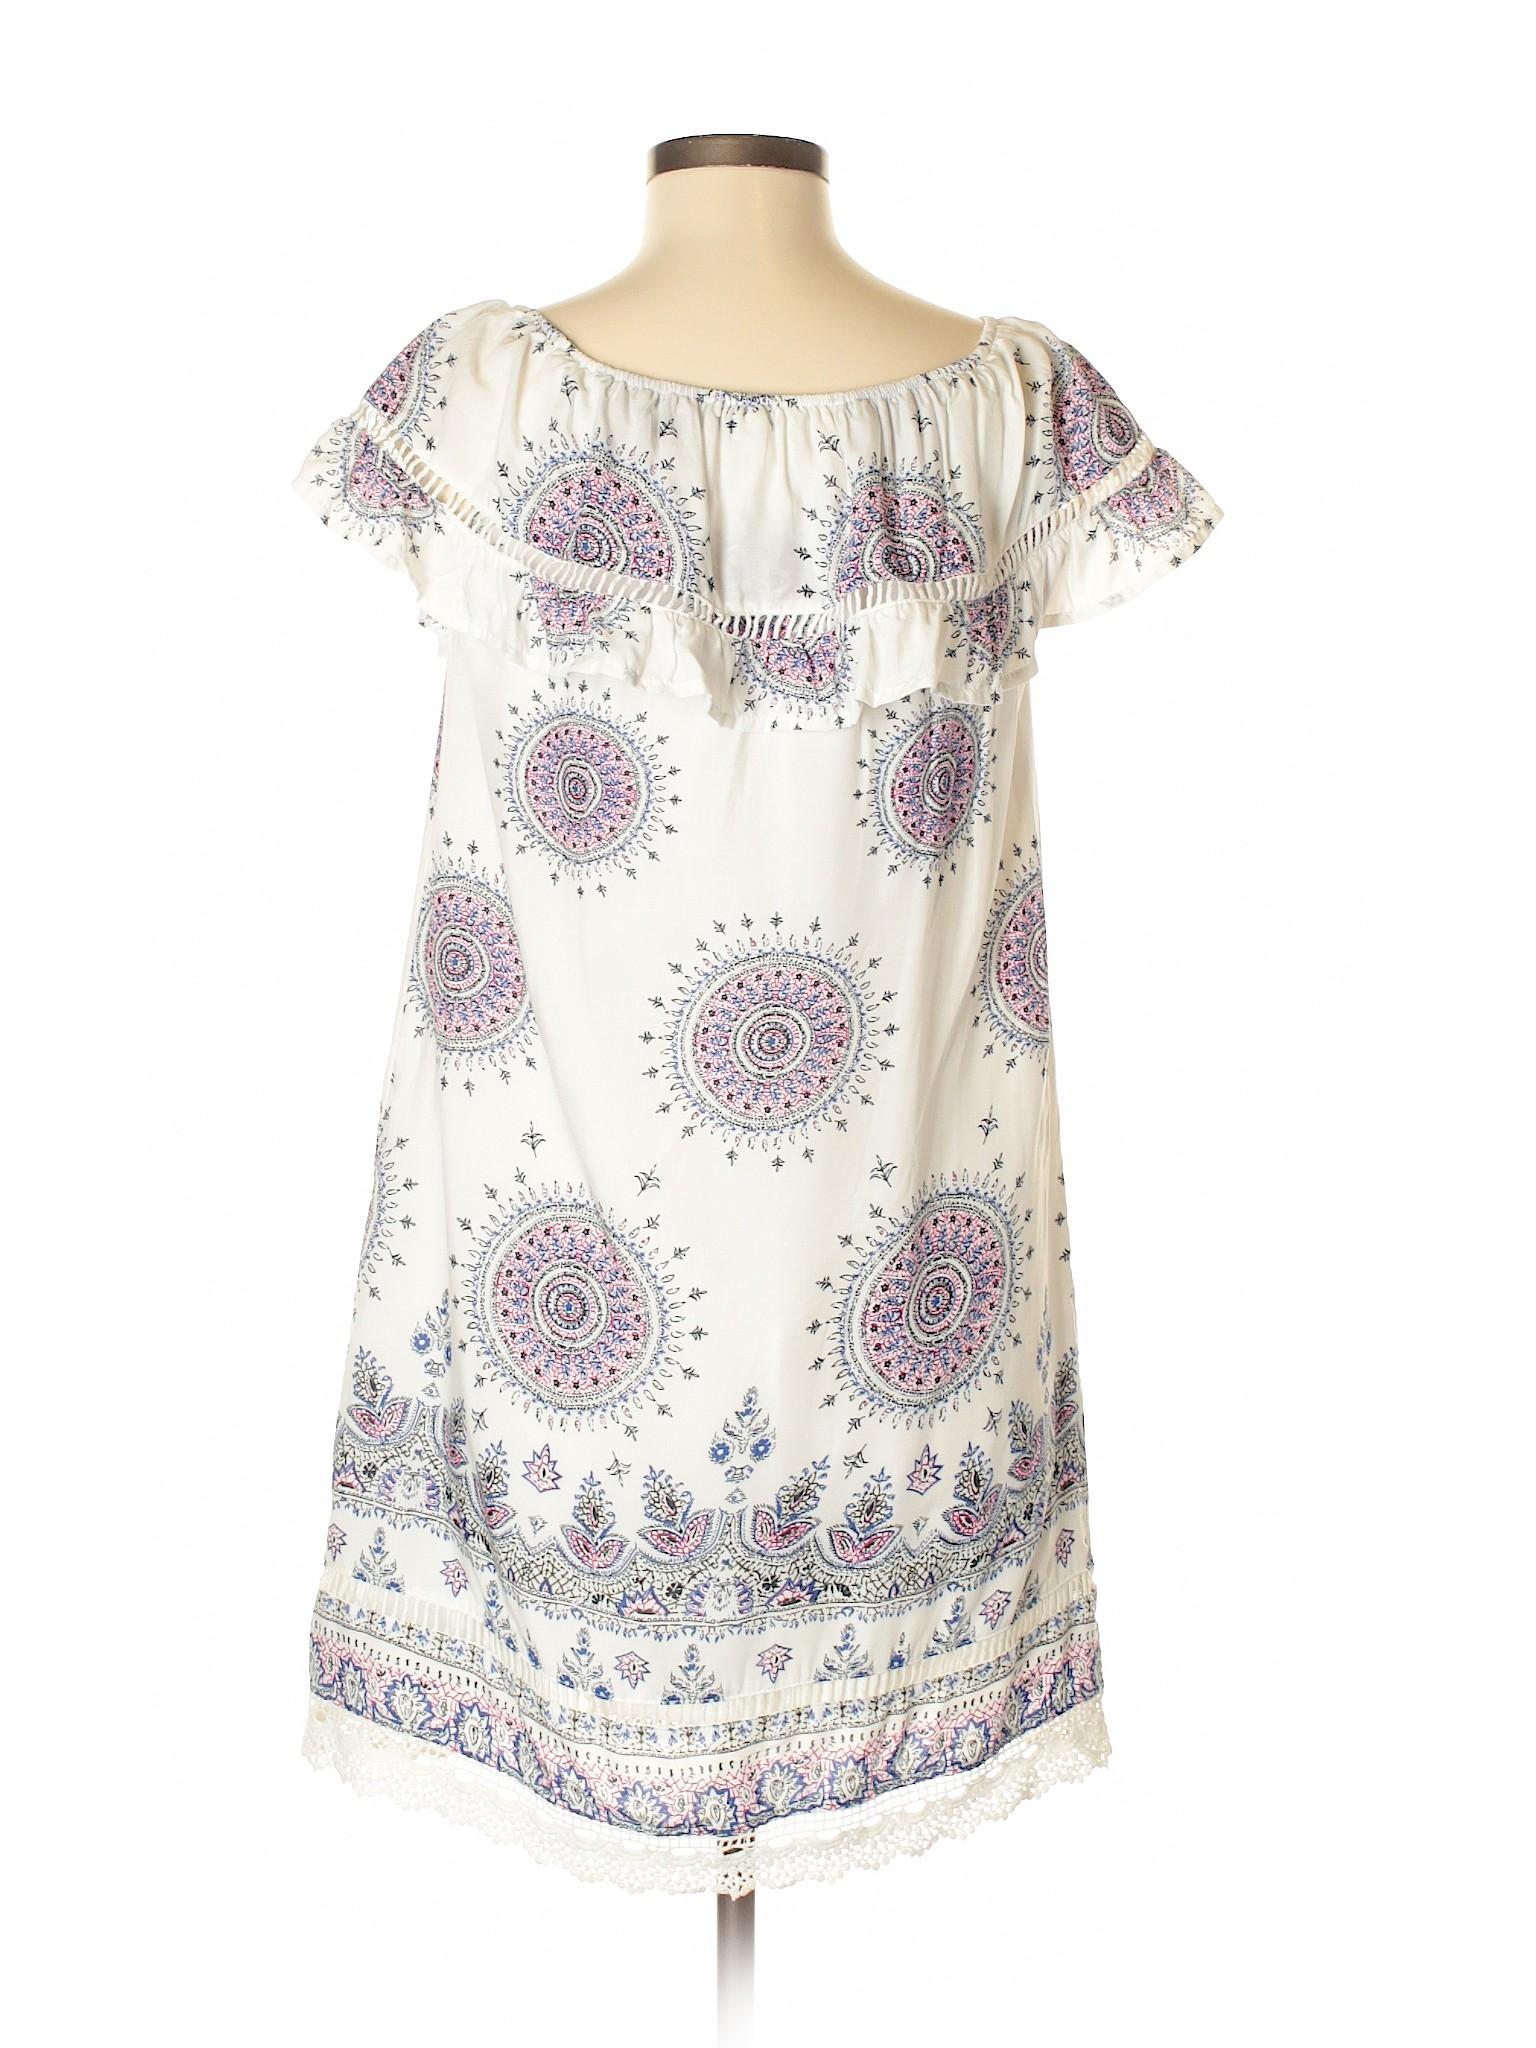 Mistic Selling Prysm Dress Mistic Selling Casual qFza81w